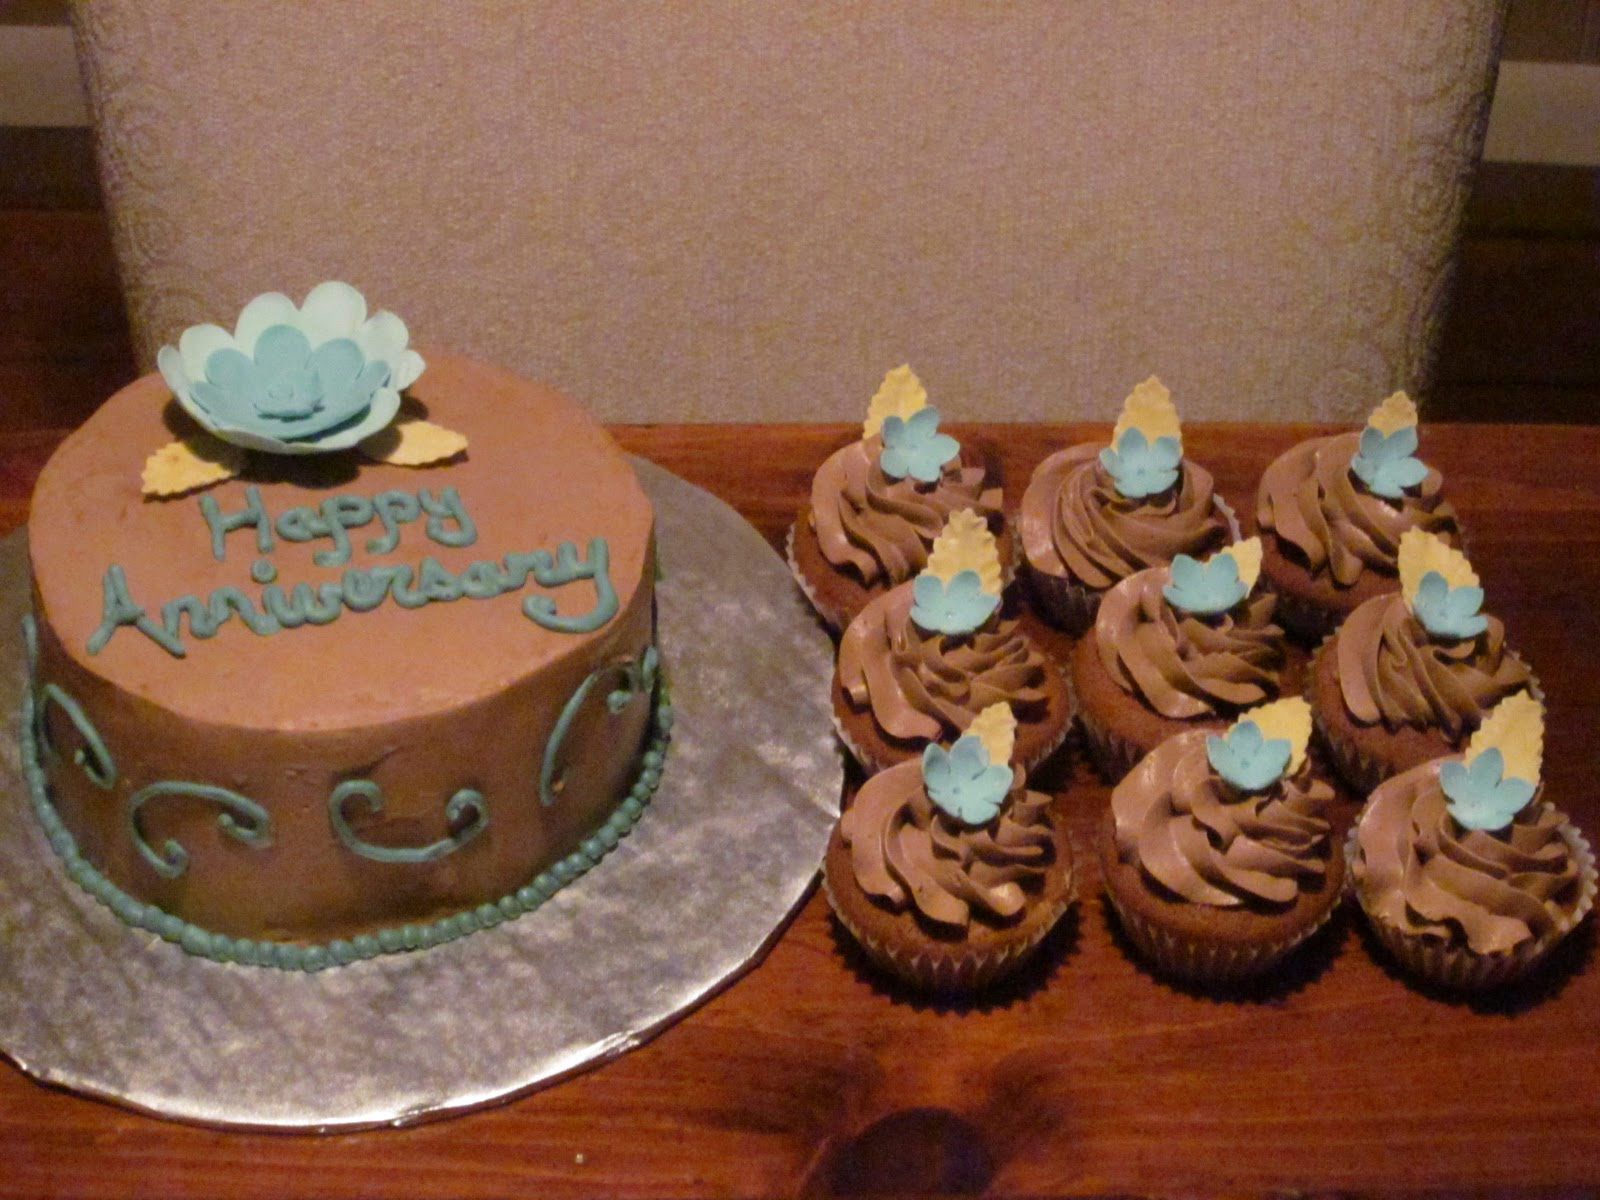 34th Wedding Anniversary Gifts: Second Generation Cake Design: Anniversary Cake